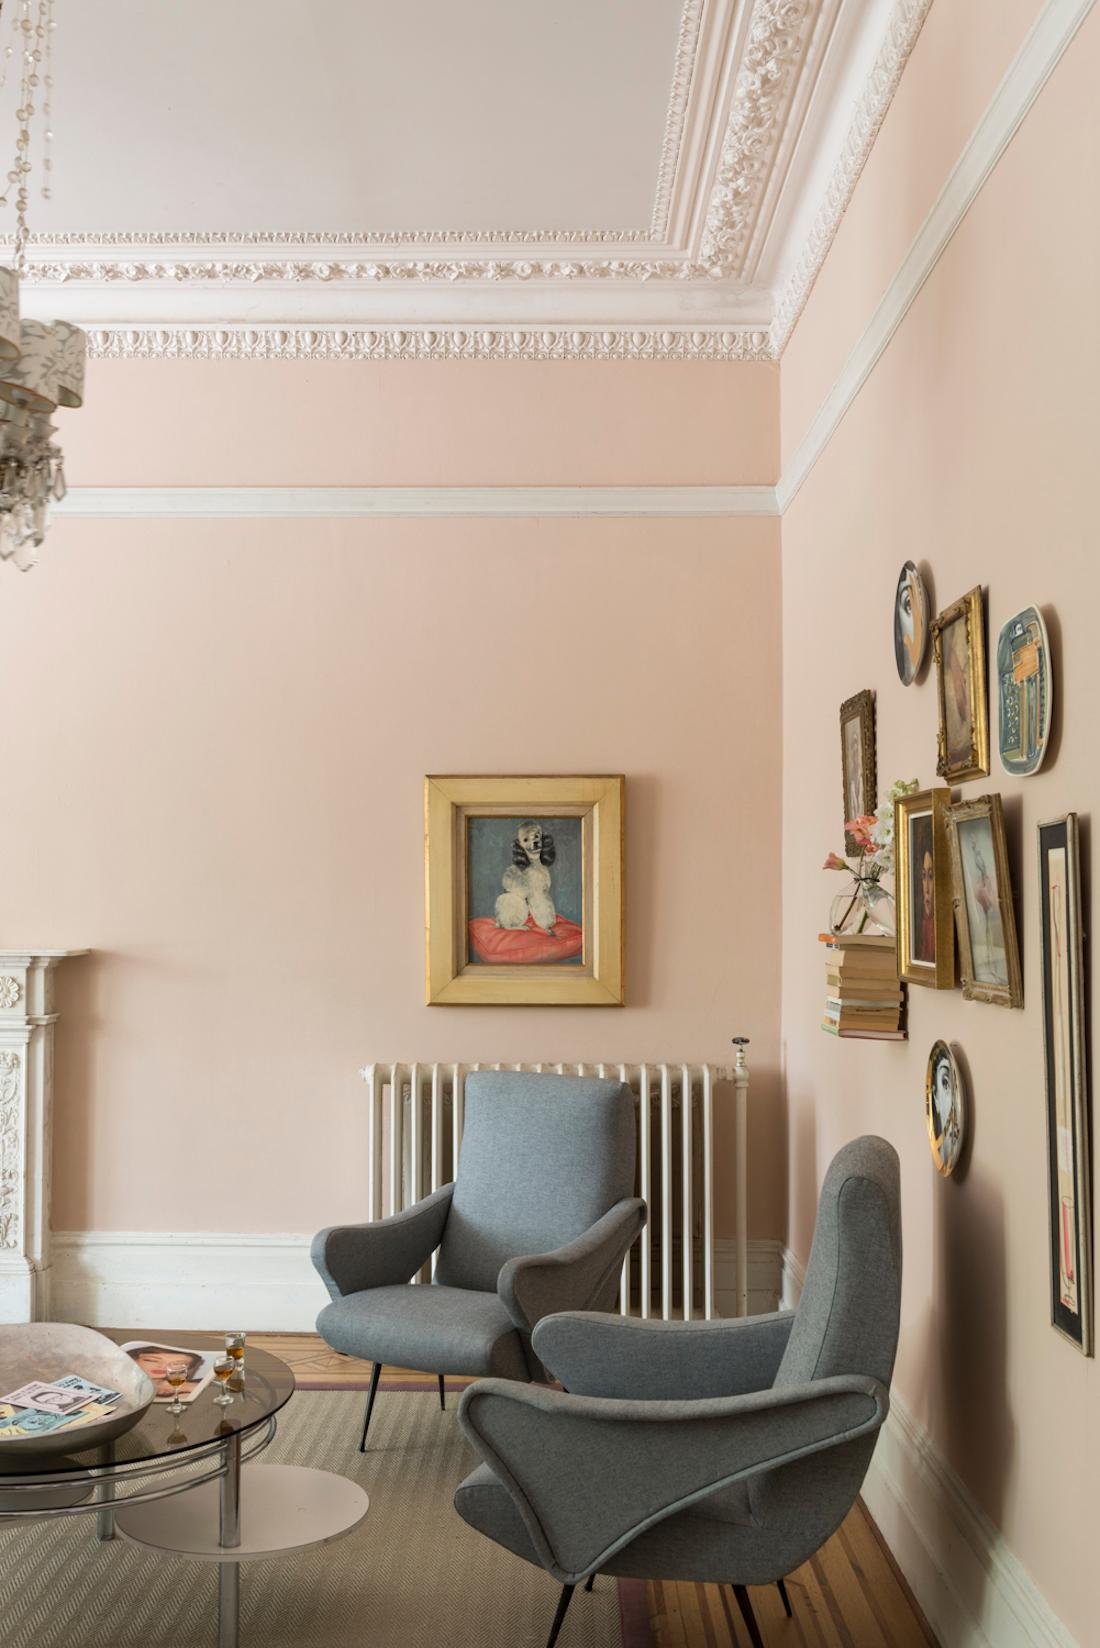 Wandgestaltung Von Farrow Ball Wandfarbe Wohnzimmergestaltung Farrowball CFarrow